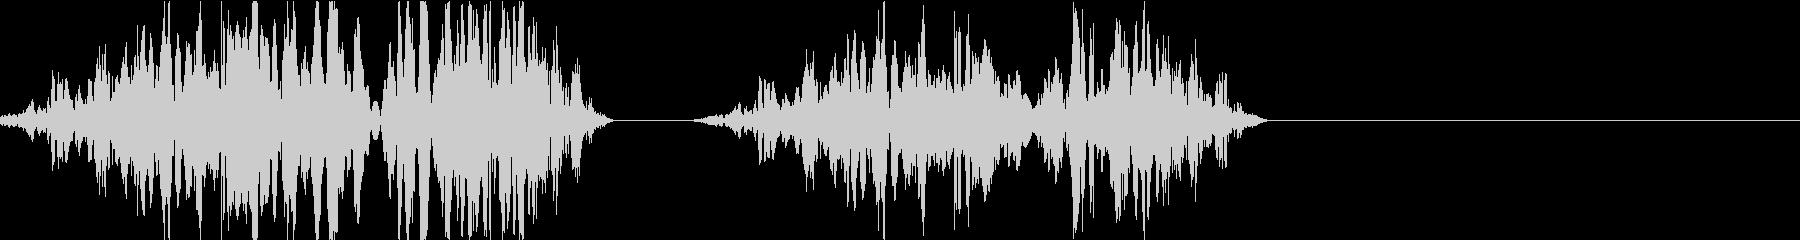 DJプレイ スクラッチ・ノイズ 212の未再生の波形